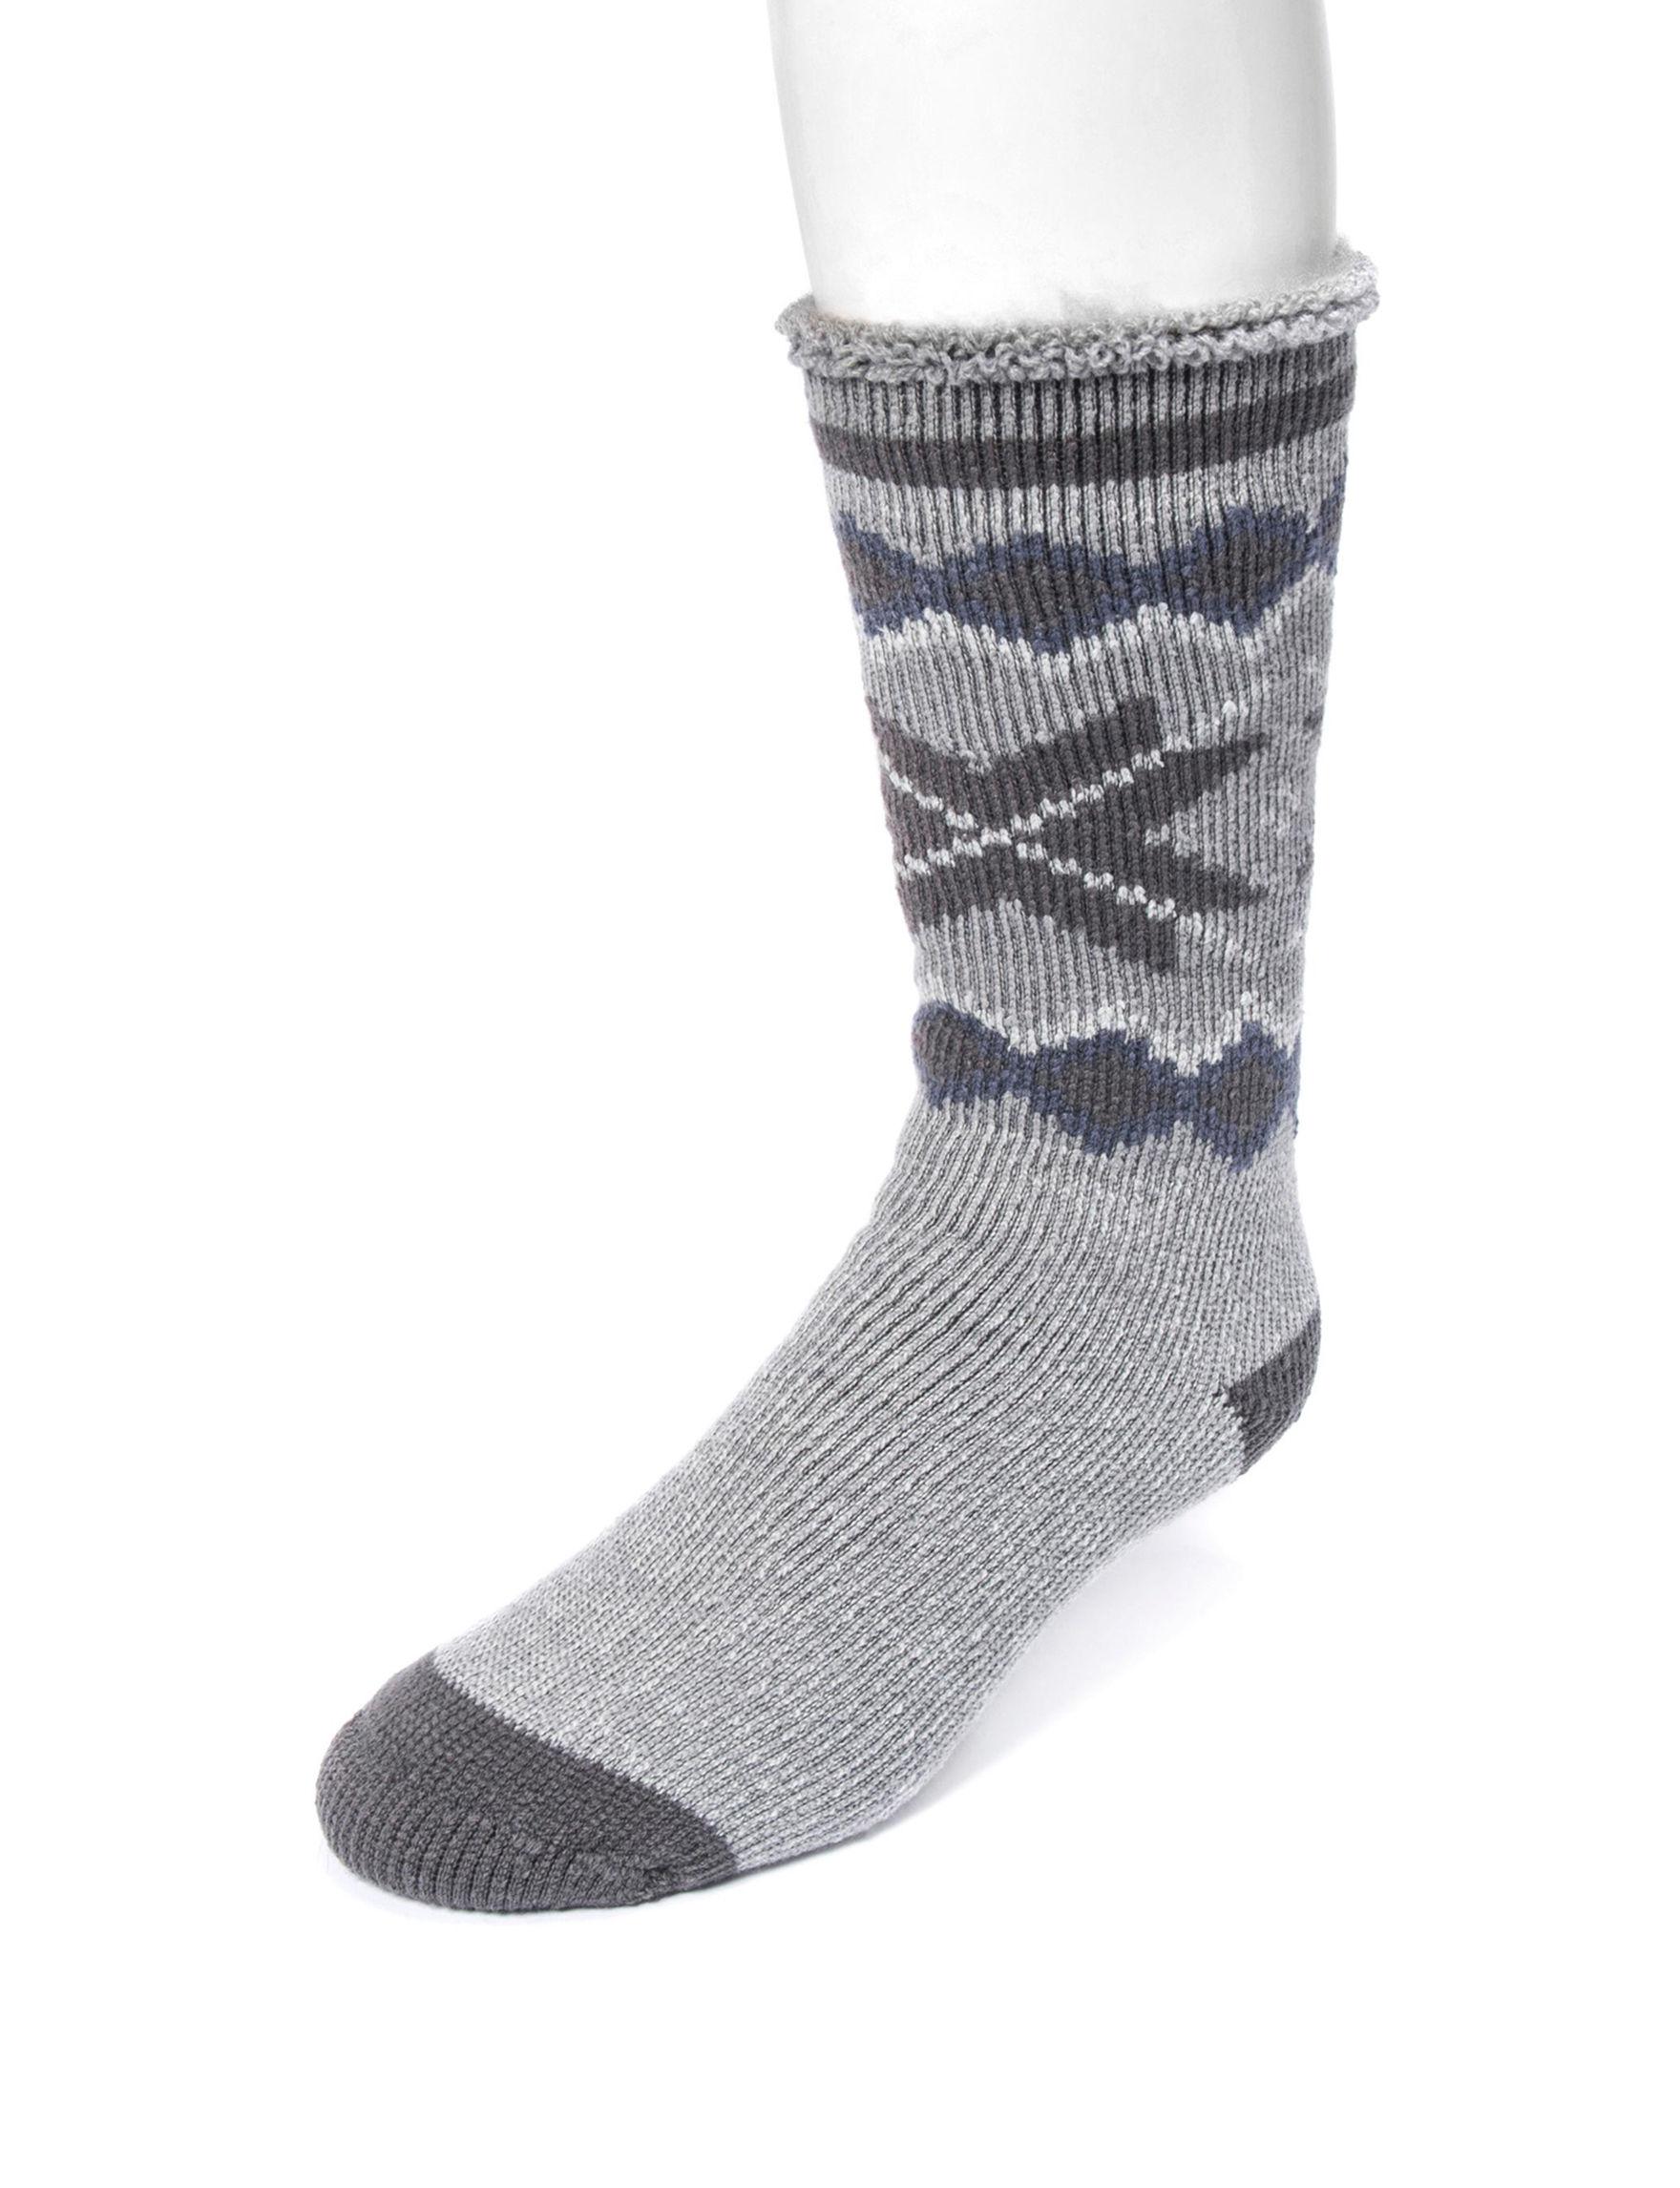 Muk Luks Grey Socks